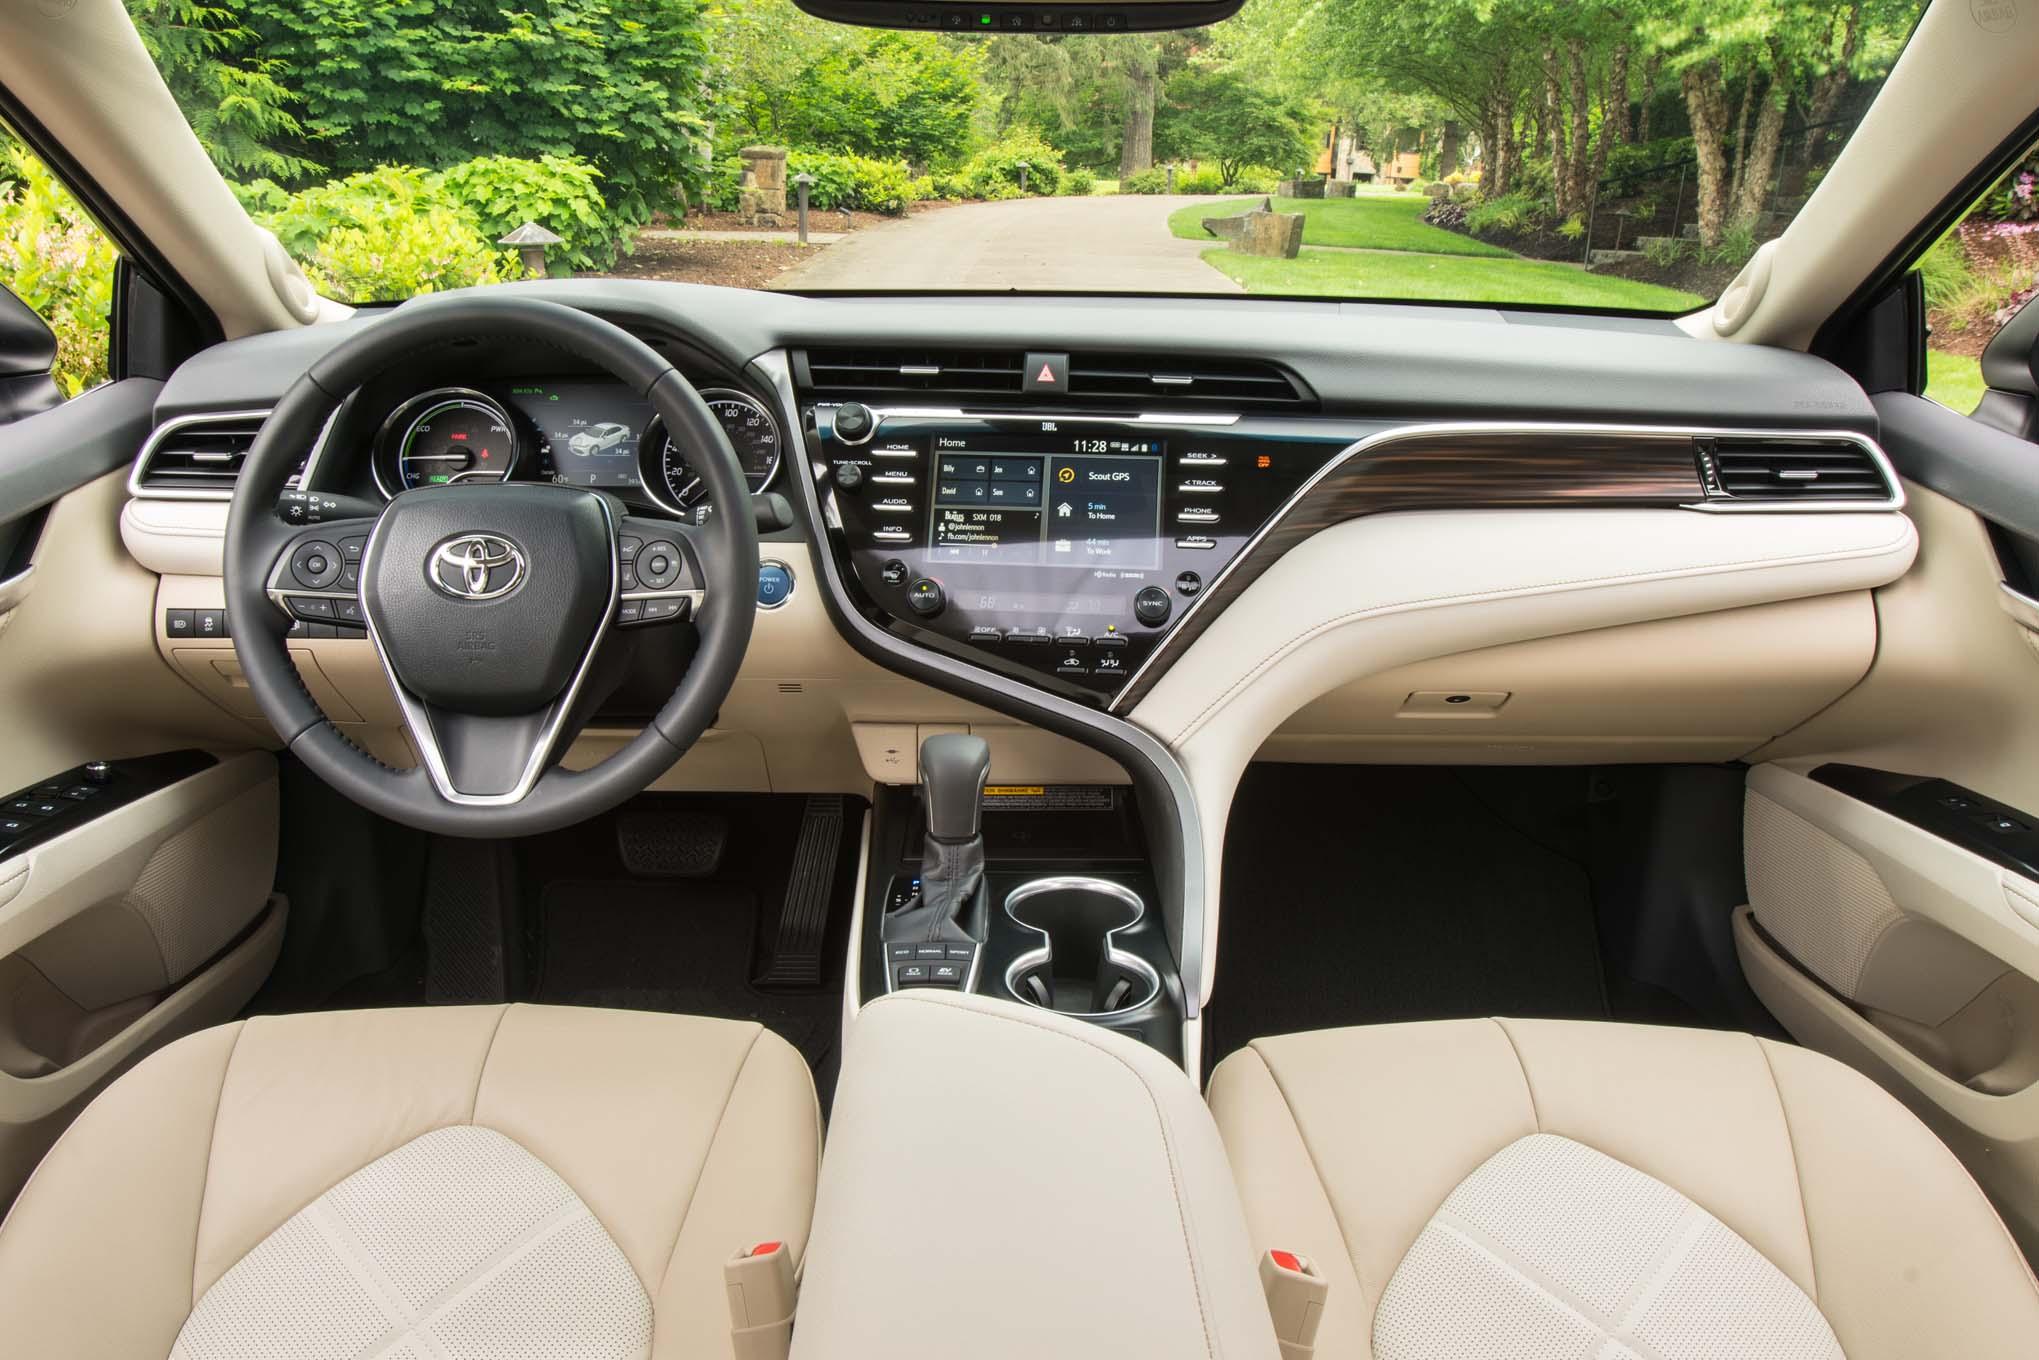 2018-toyota-camry-hybrid-xle-interior